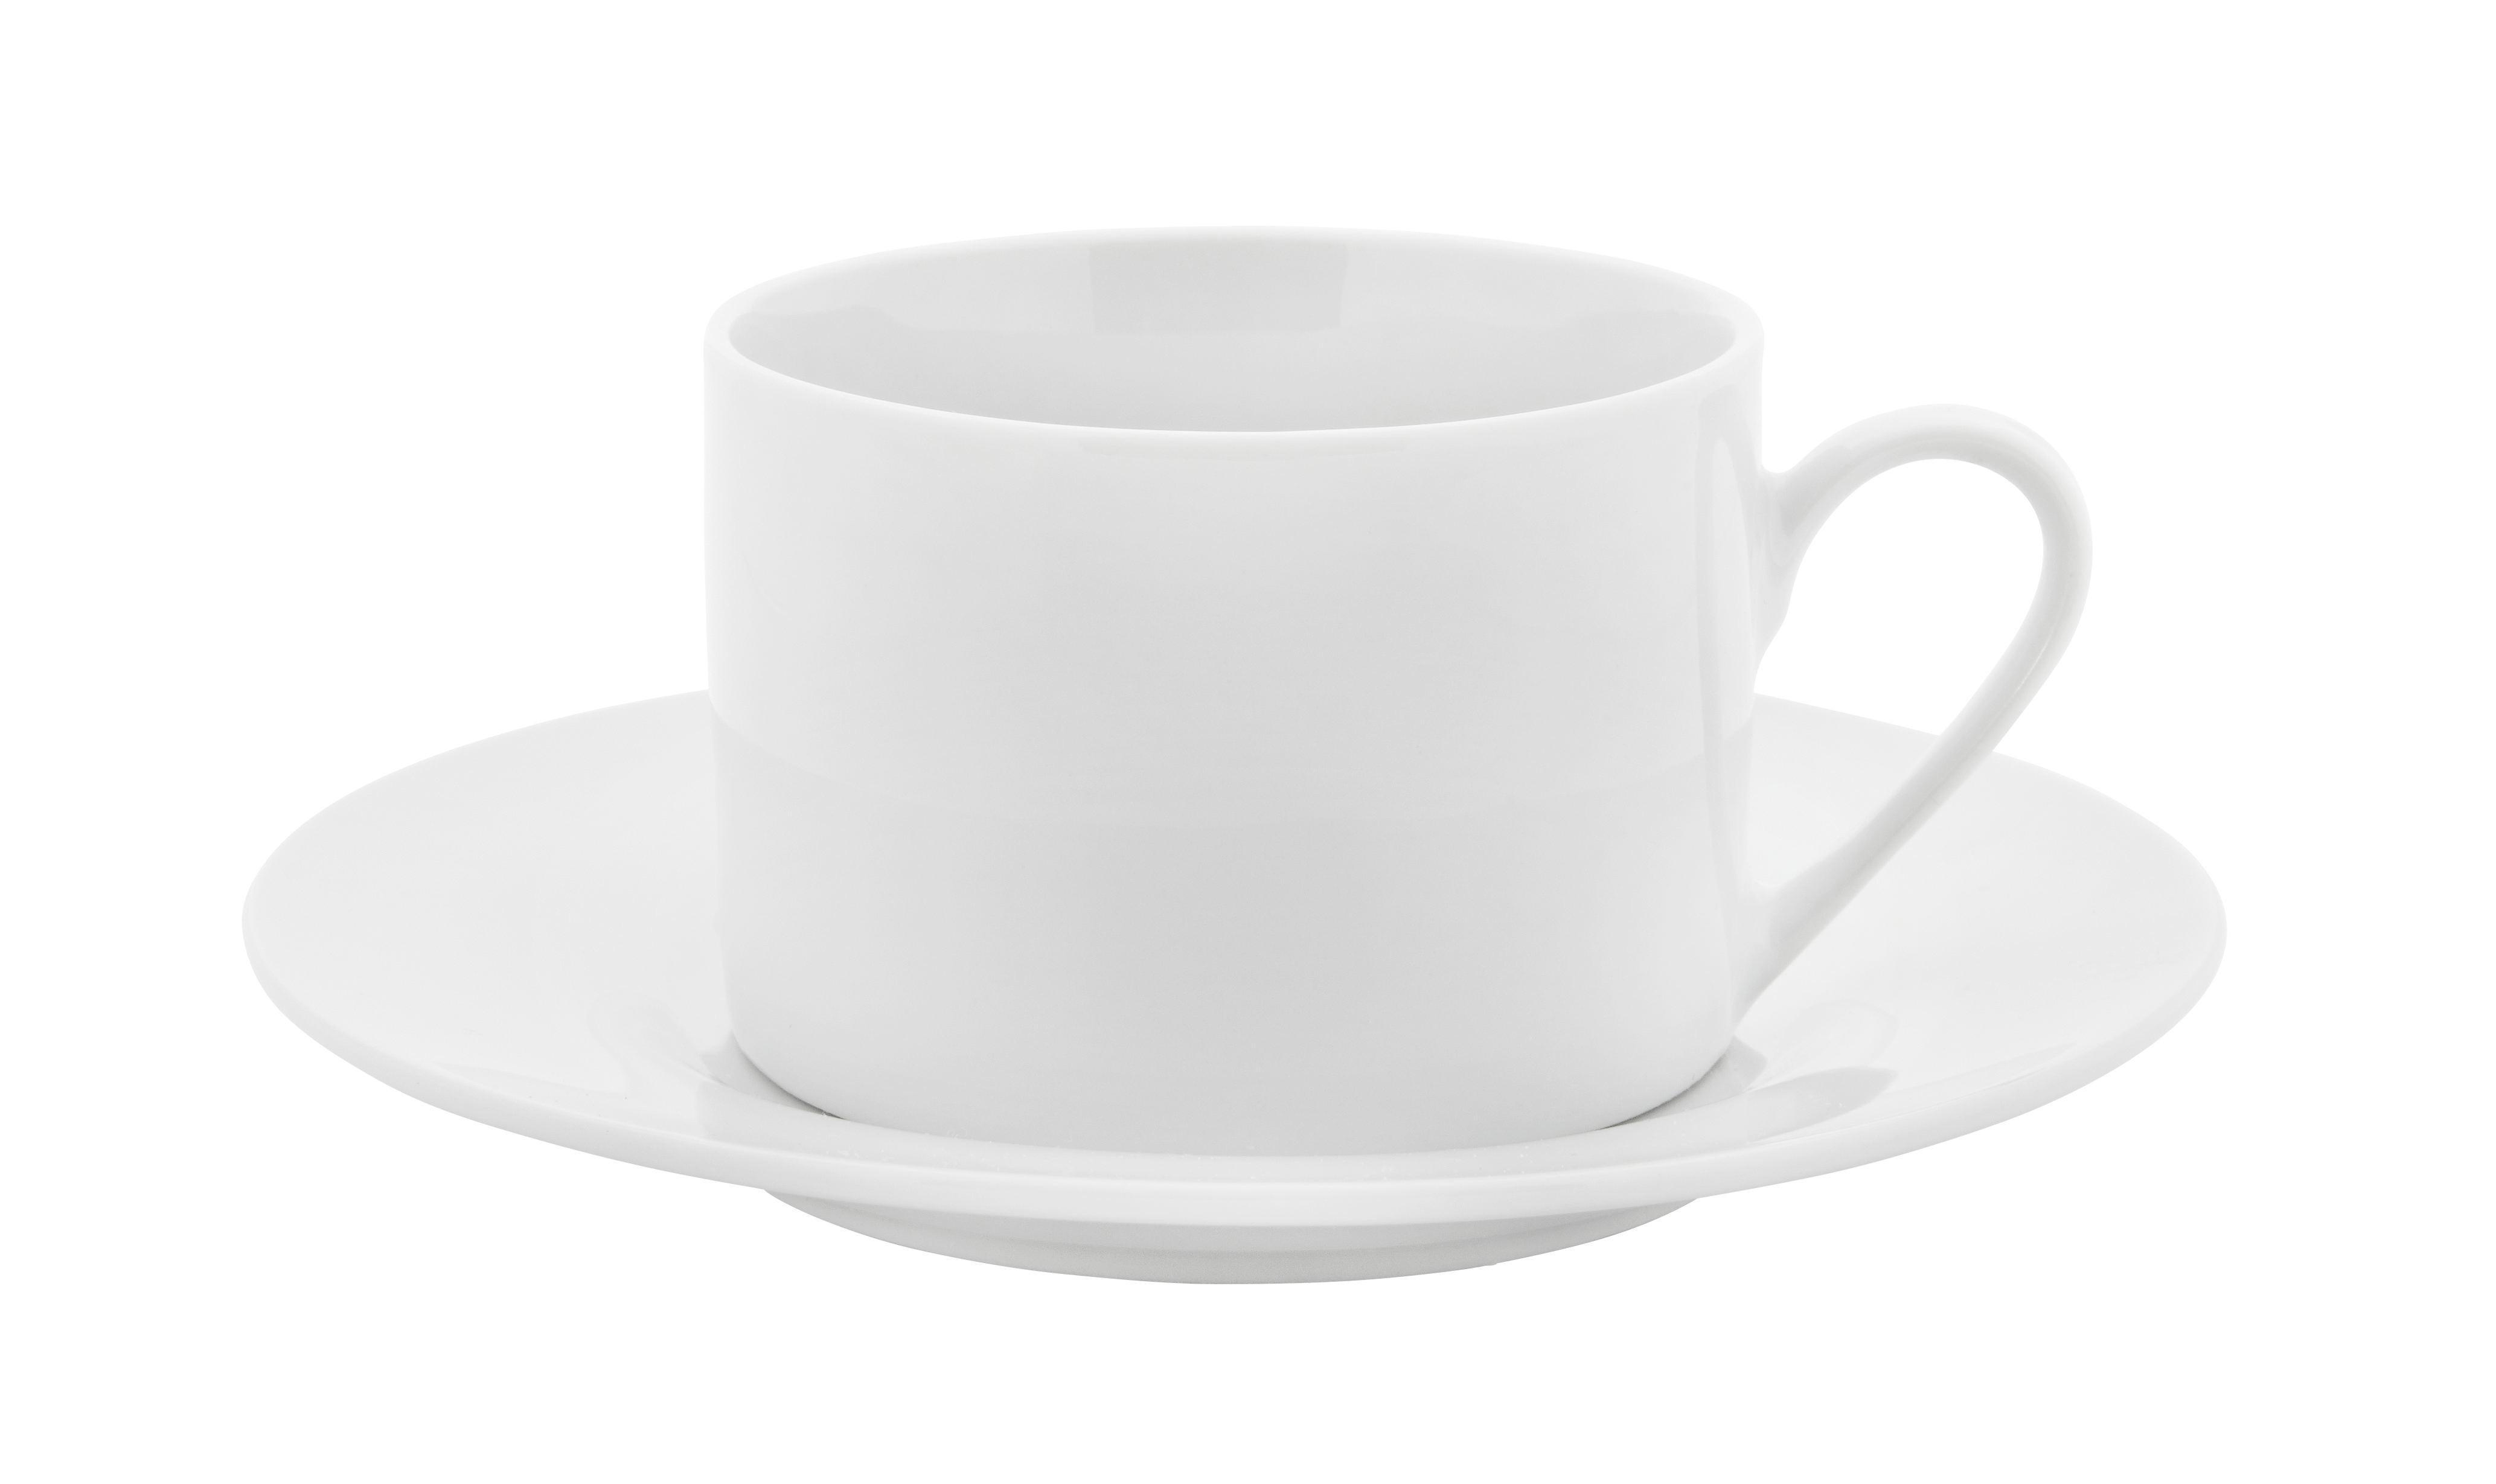 Skodelica Za Kavo S Krožničkom Adria - bela, Konvencionalno, keramika (15,8cm) - MÖMAX modern living